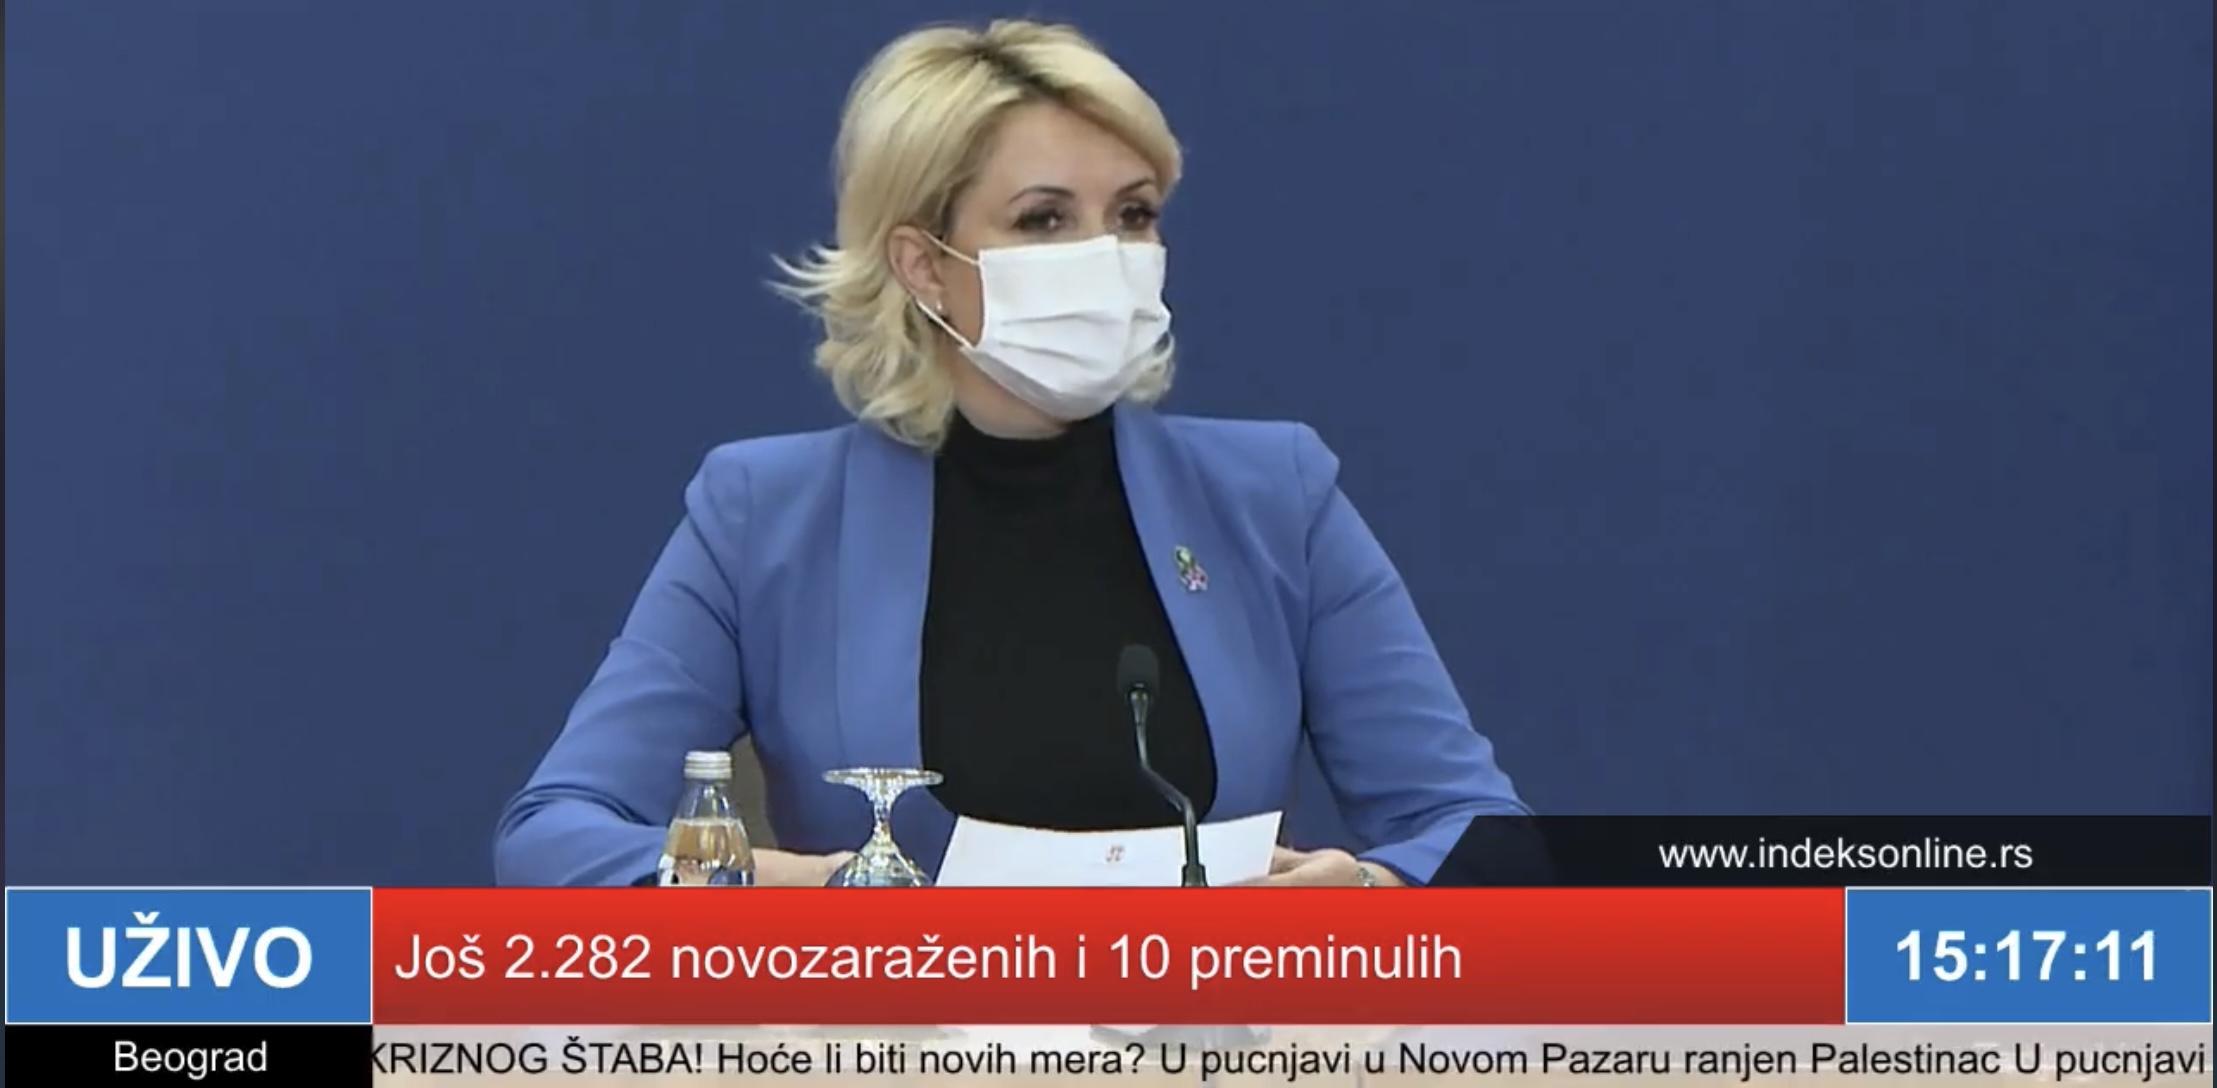 srbija:-zarazene-jos-2.282-osobe,-preminulo-deset